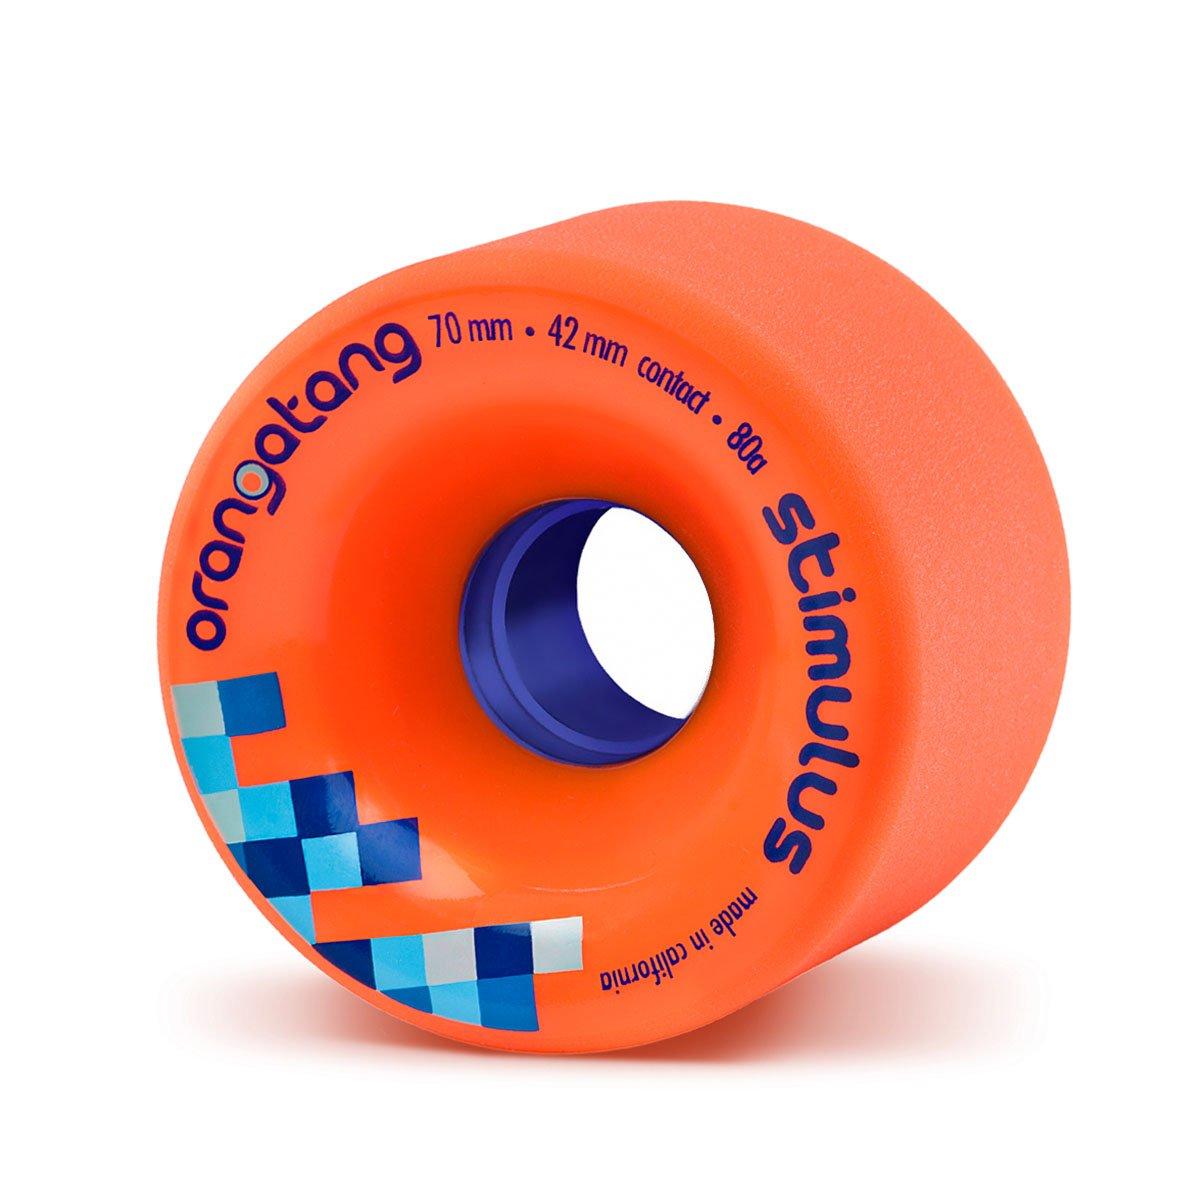 Orangatang Stimulus 70 mm 80a Freeride Longboard Skateboard Wheels (Orange, Set of 4) by Orangatang